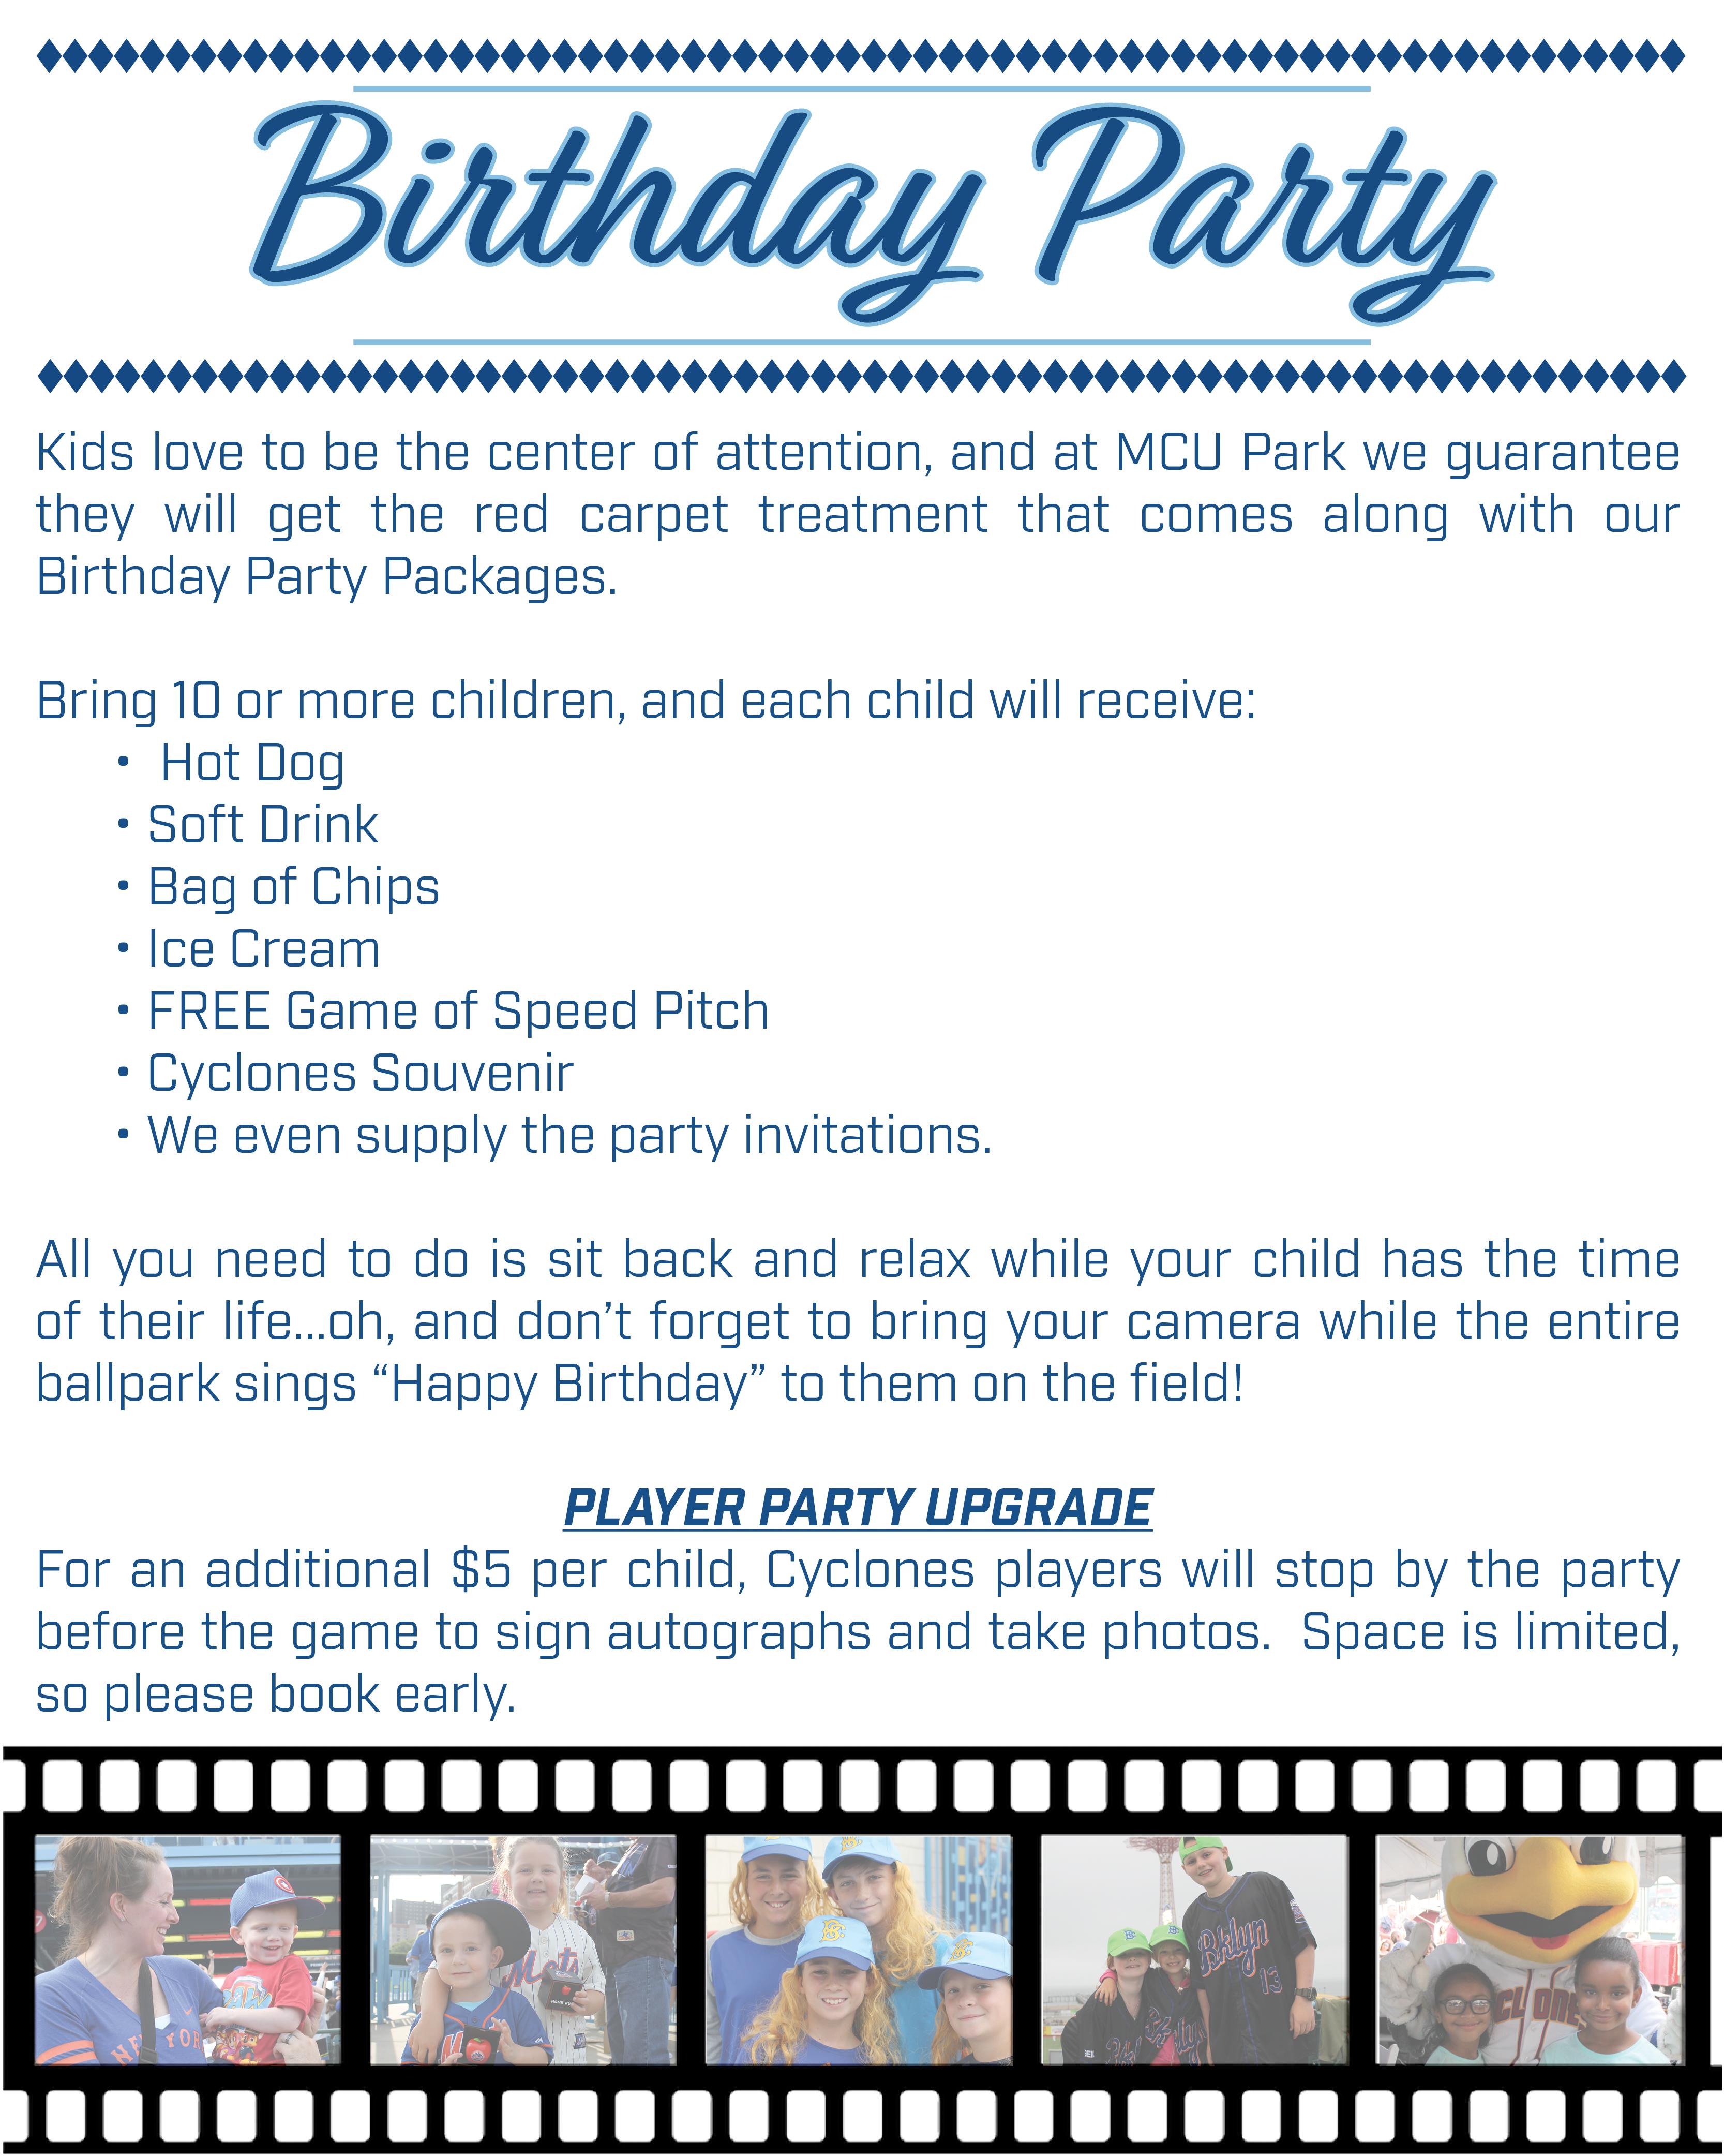 brooklyncyclones.com: Birthday Parties